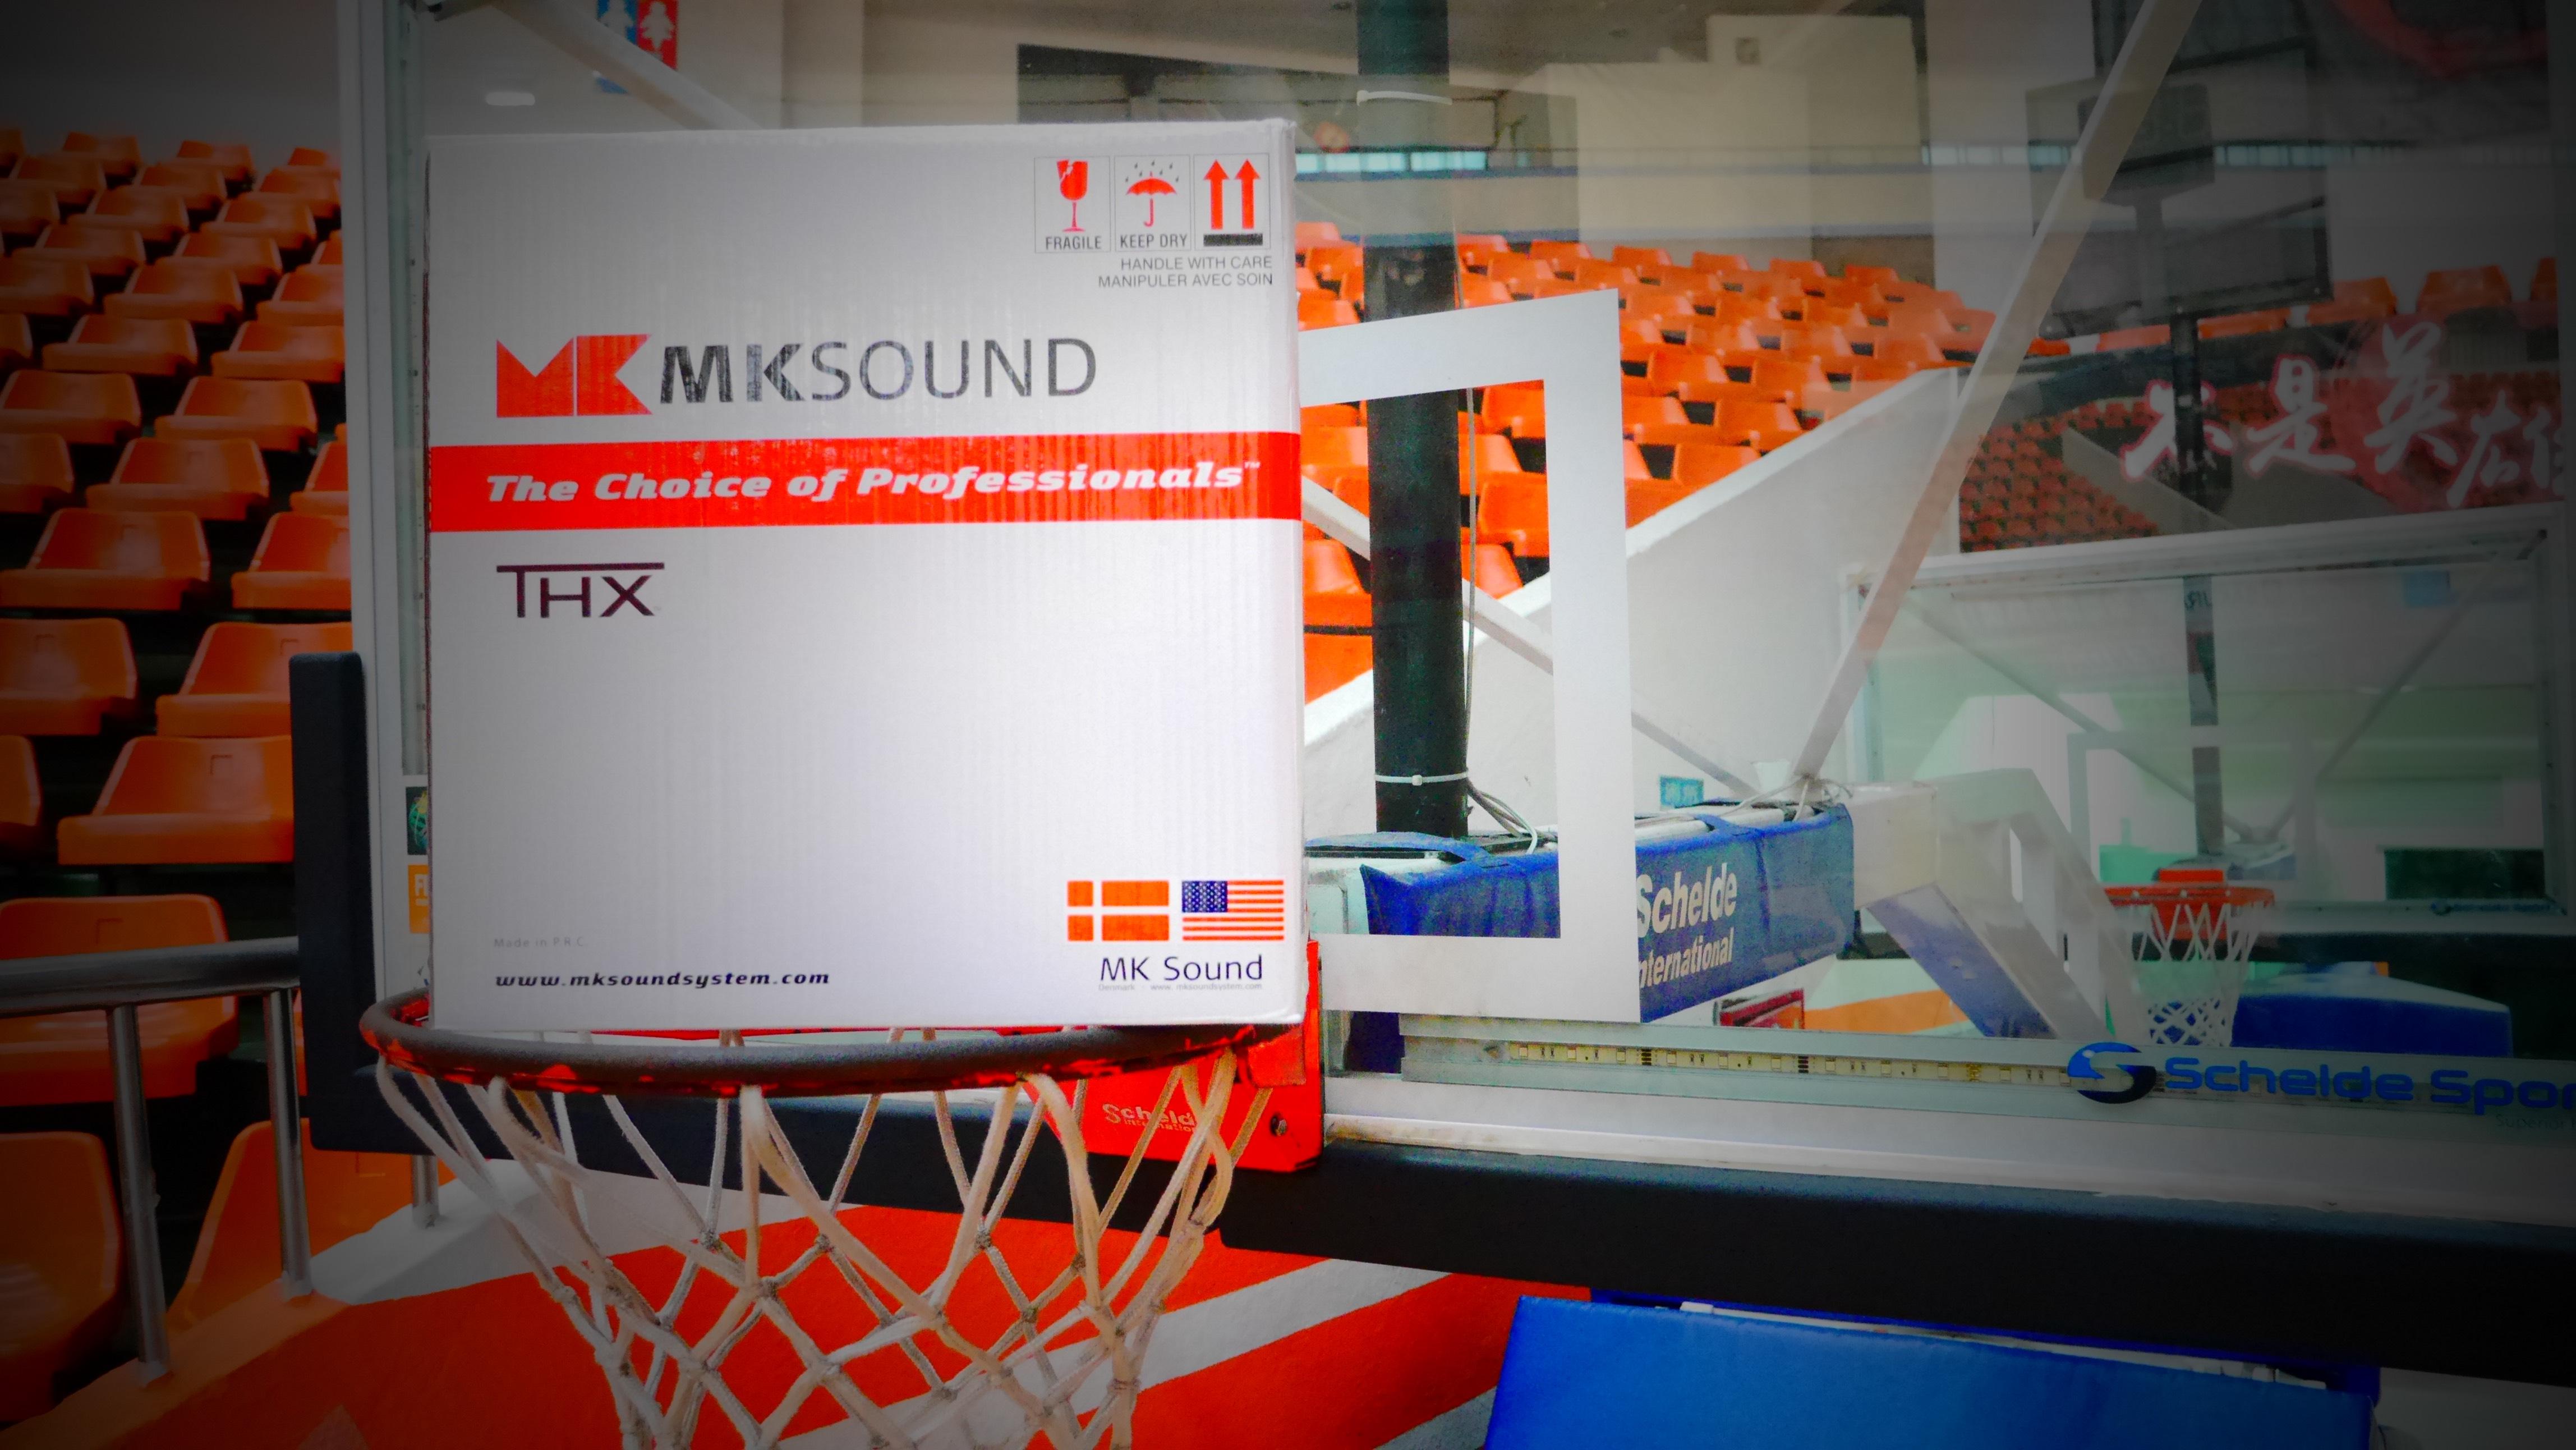 M&K SOUND與籃球的結合